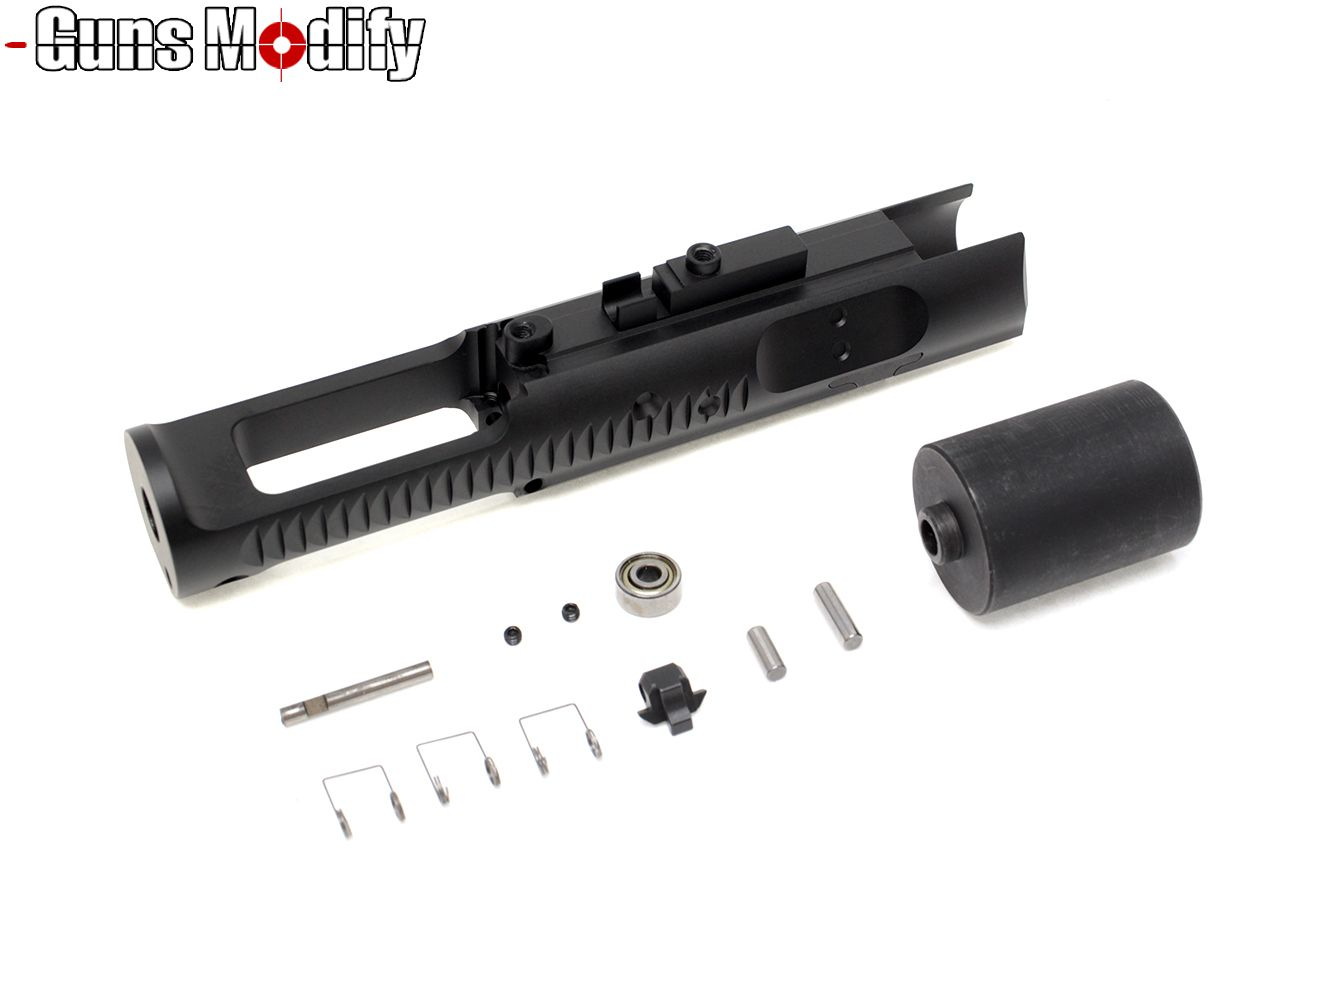 Guns Modify A7003T6 CNC ZERO スピードボルトキャリア TM M4 MWS◆マルイ GBB M4 ガンズモディファイ ボルト アルミ削り出し アルミ合金 高耐久 カスタム